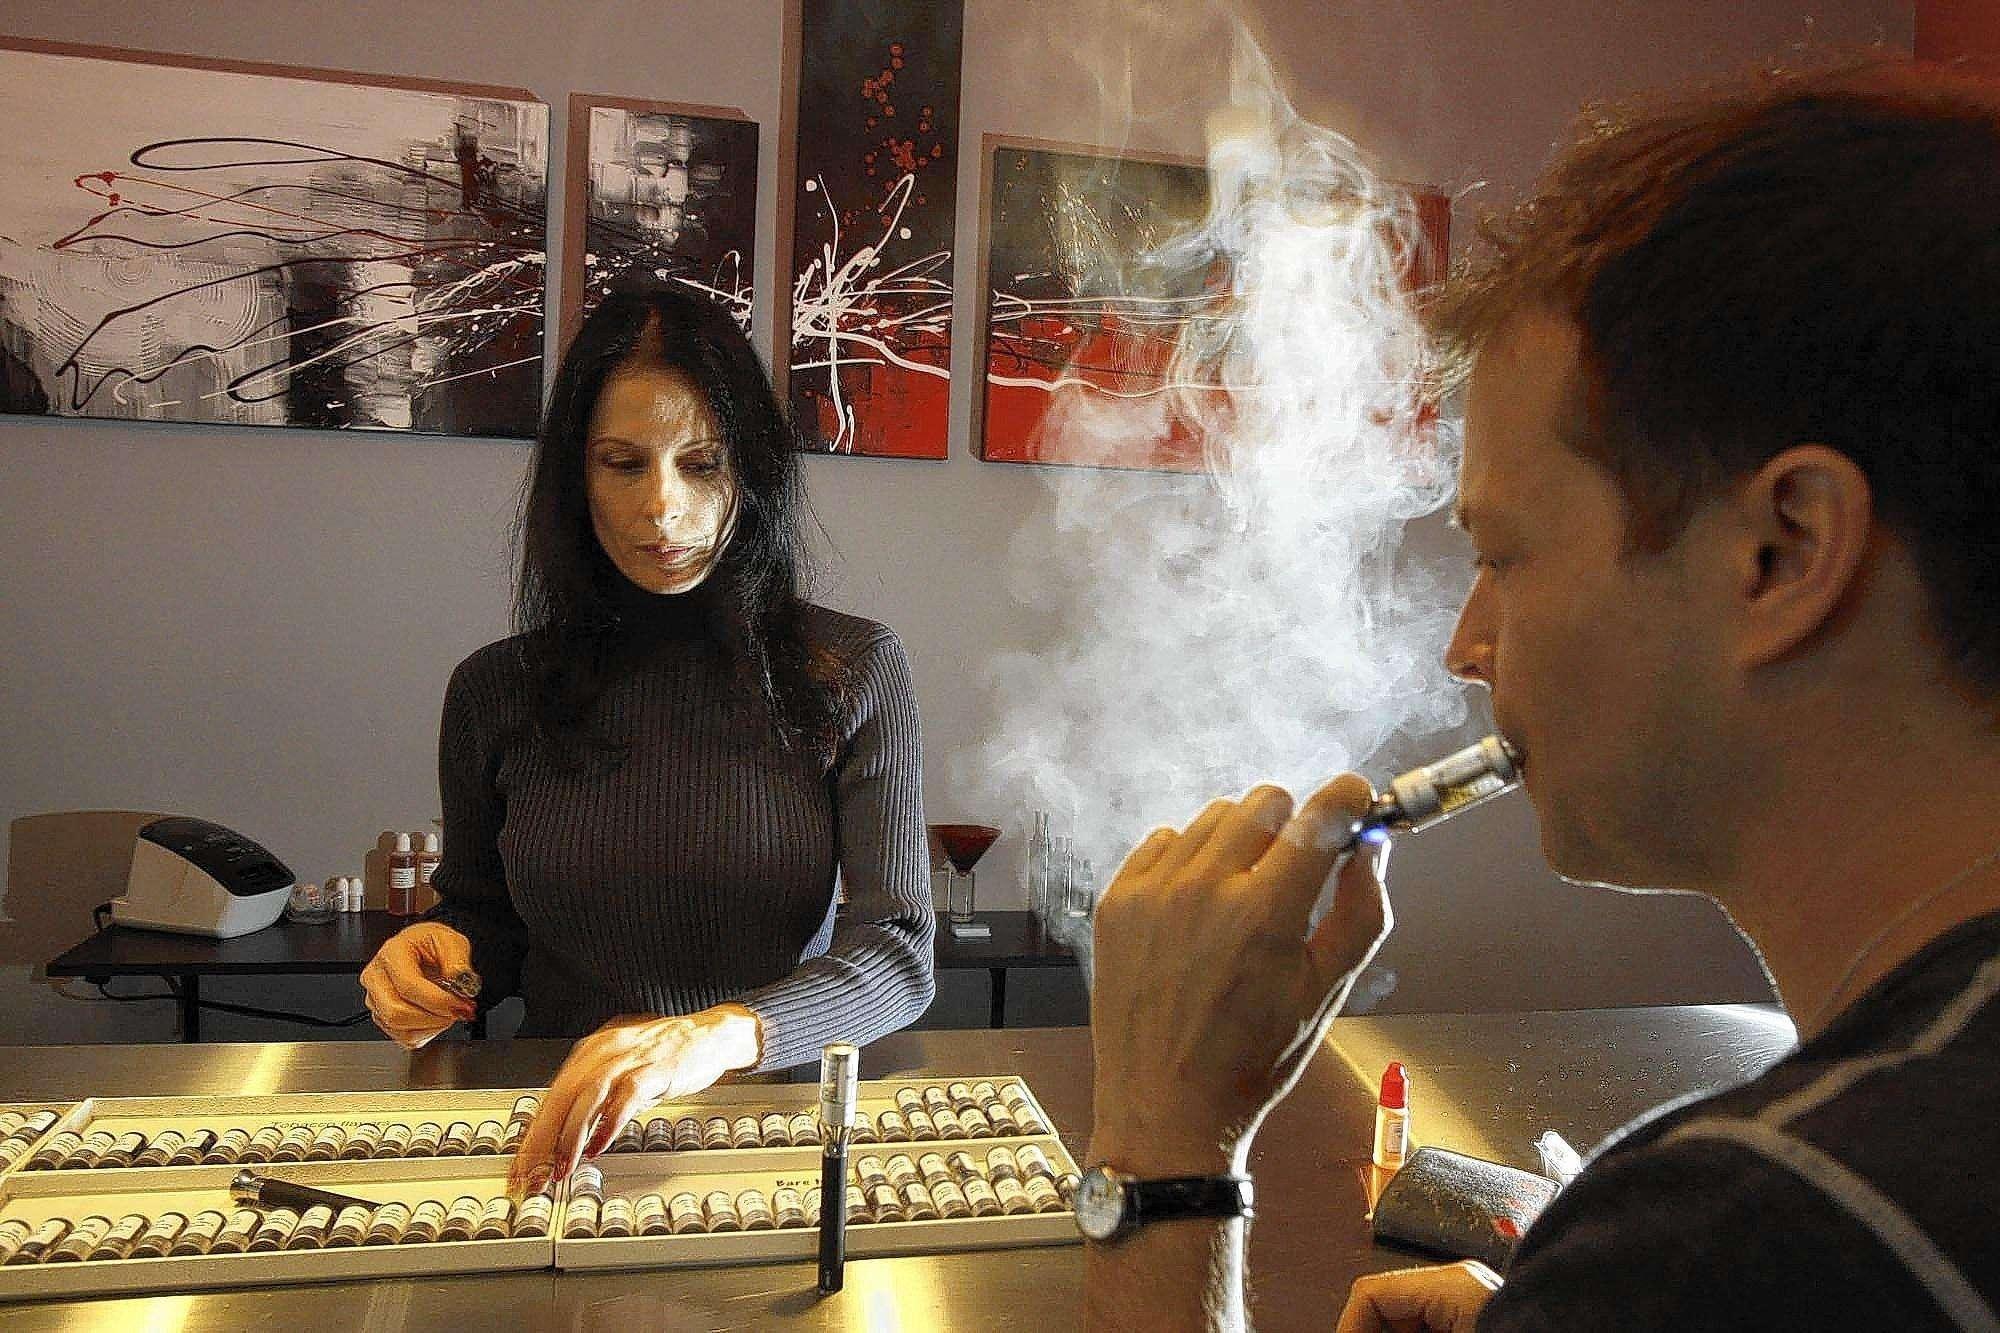 la-1783265-me-0224-ecigarettes-1-gf-jpg-20140304